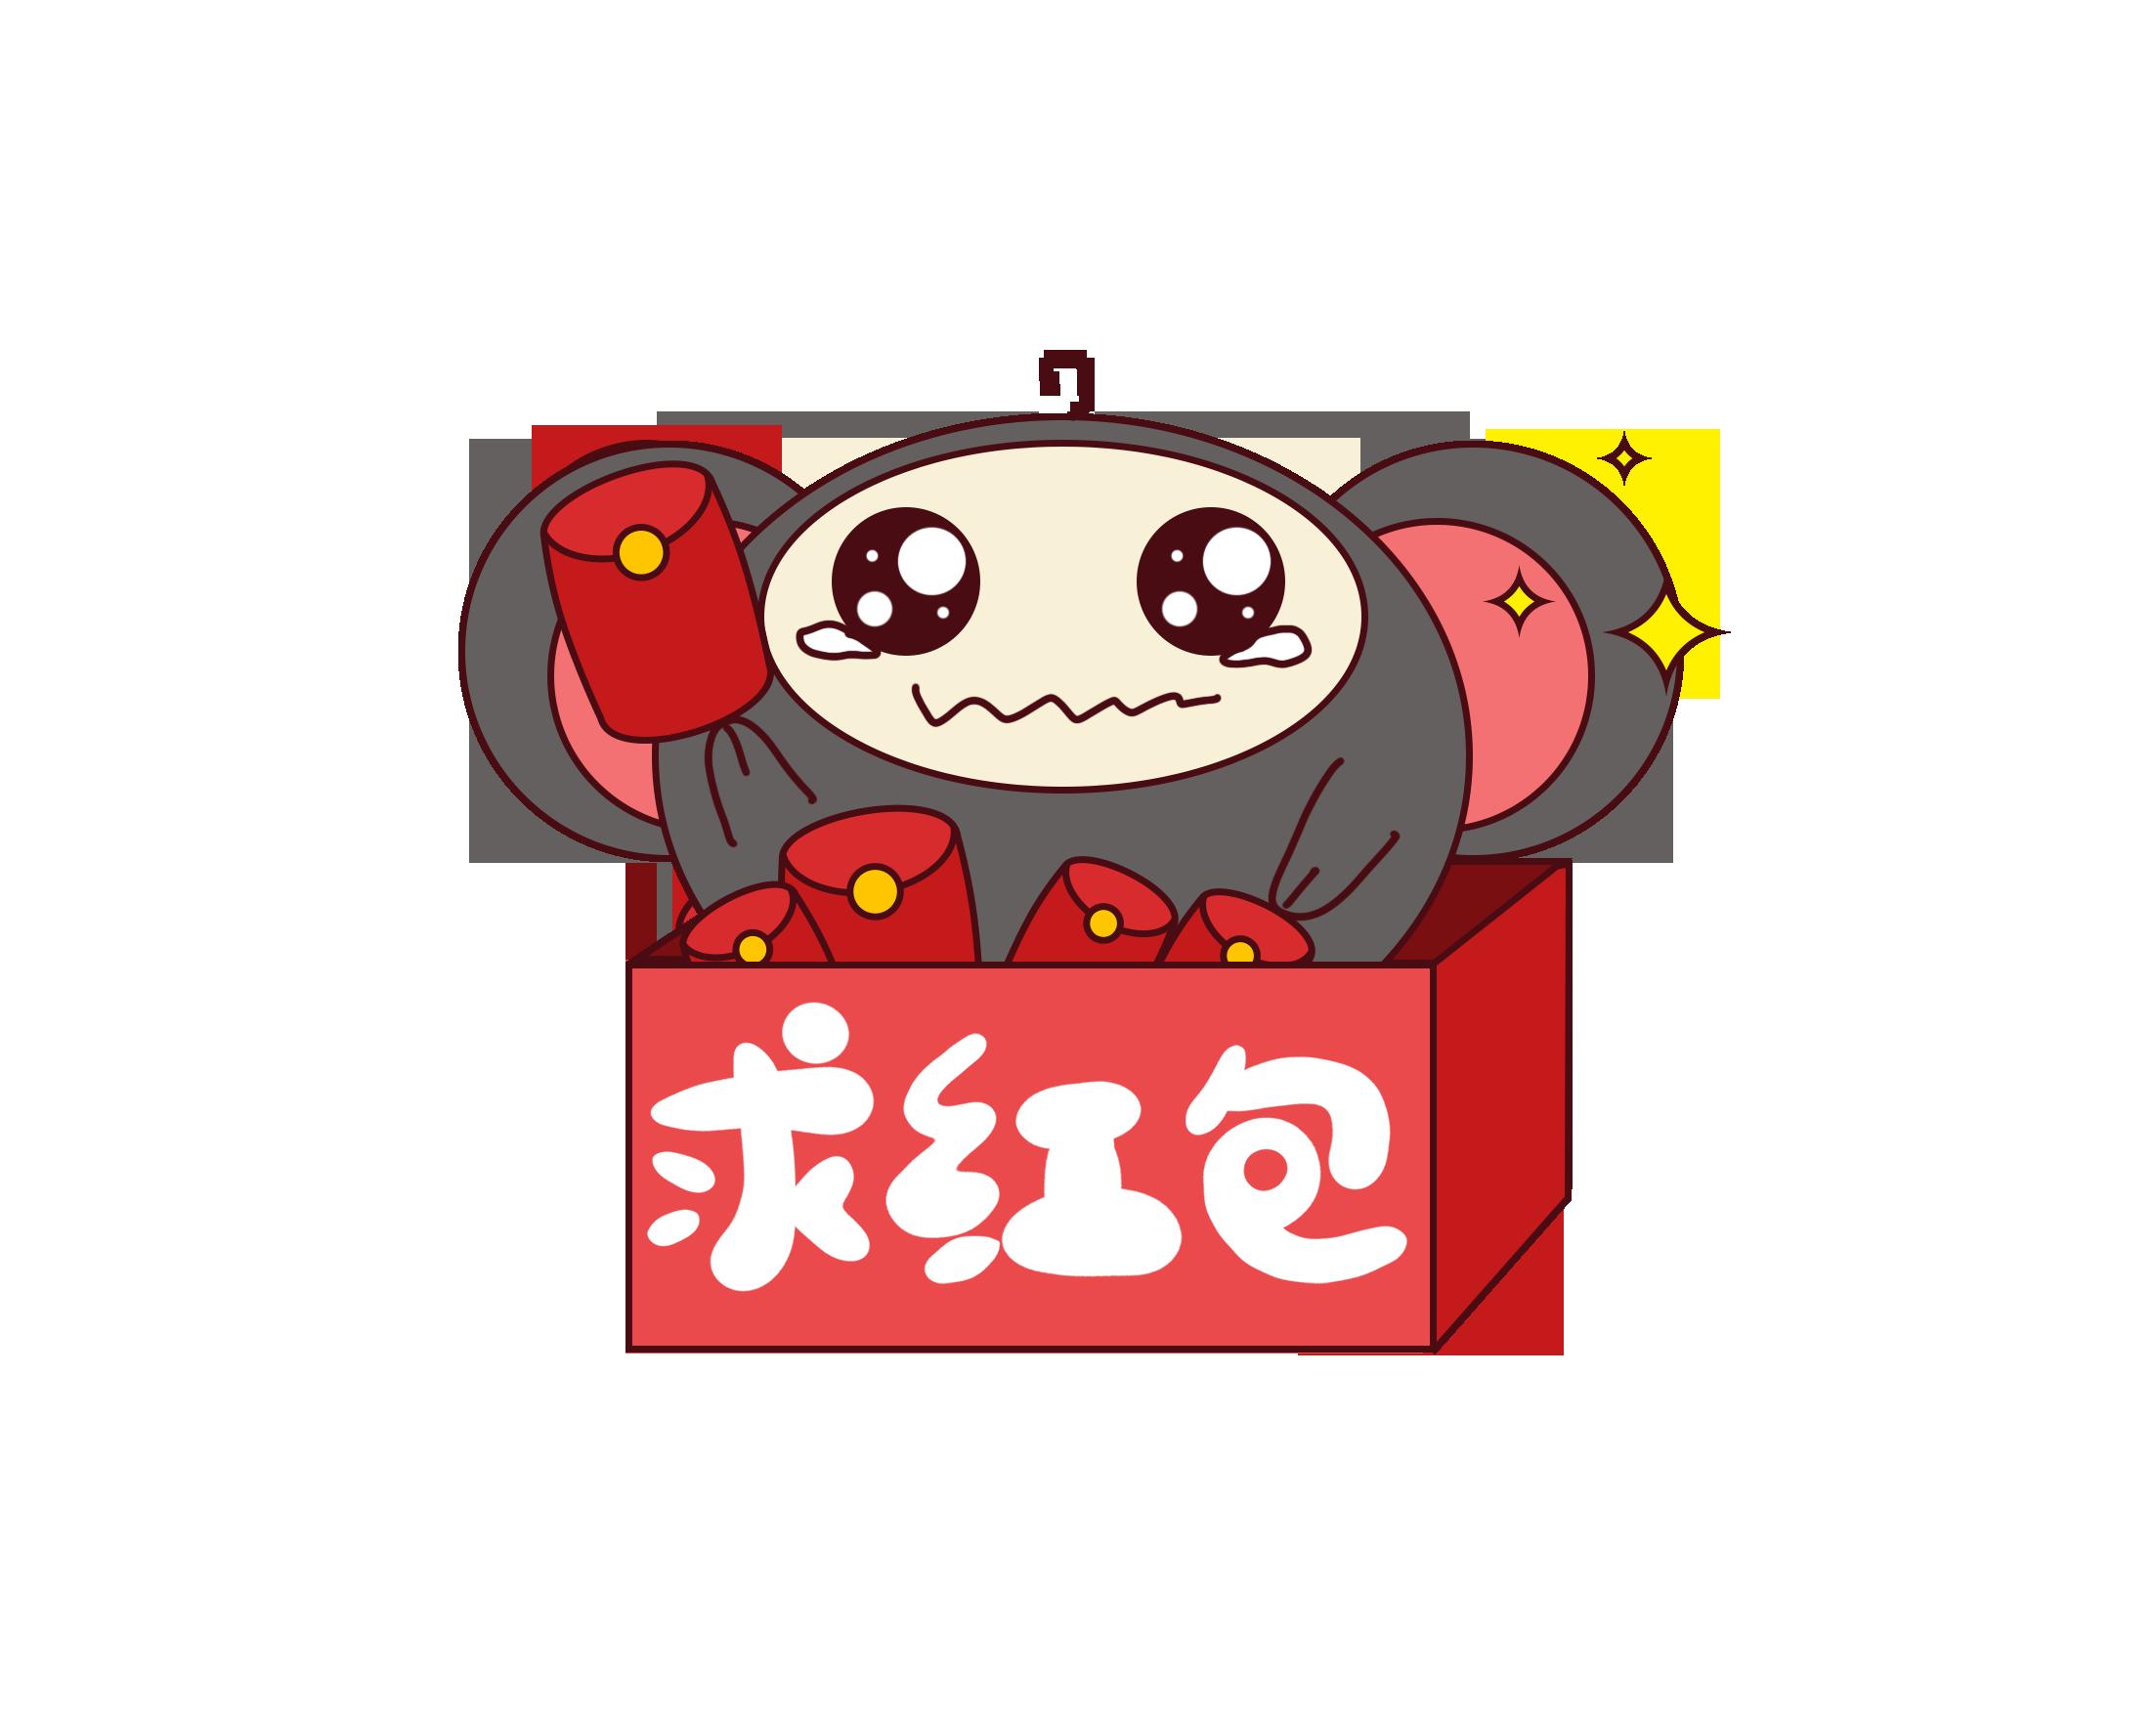 小福鼠好运连年 messages sticker-2